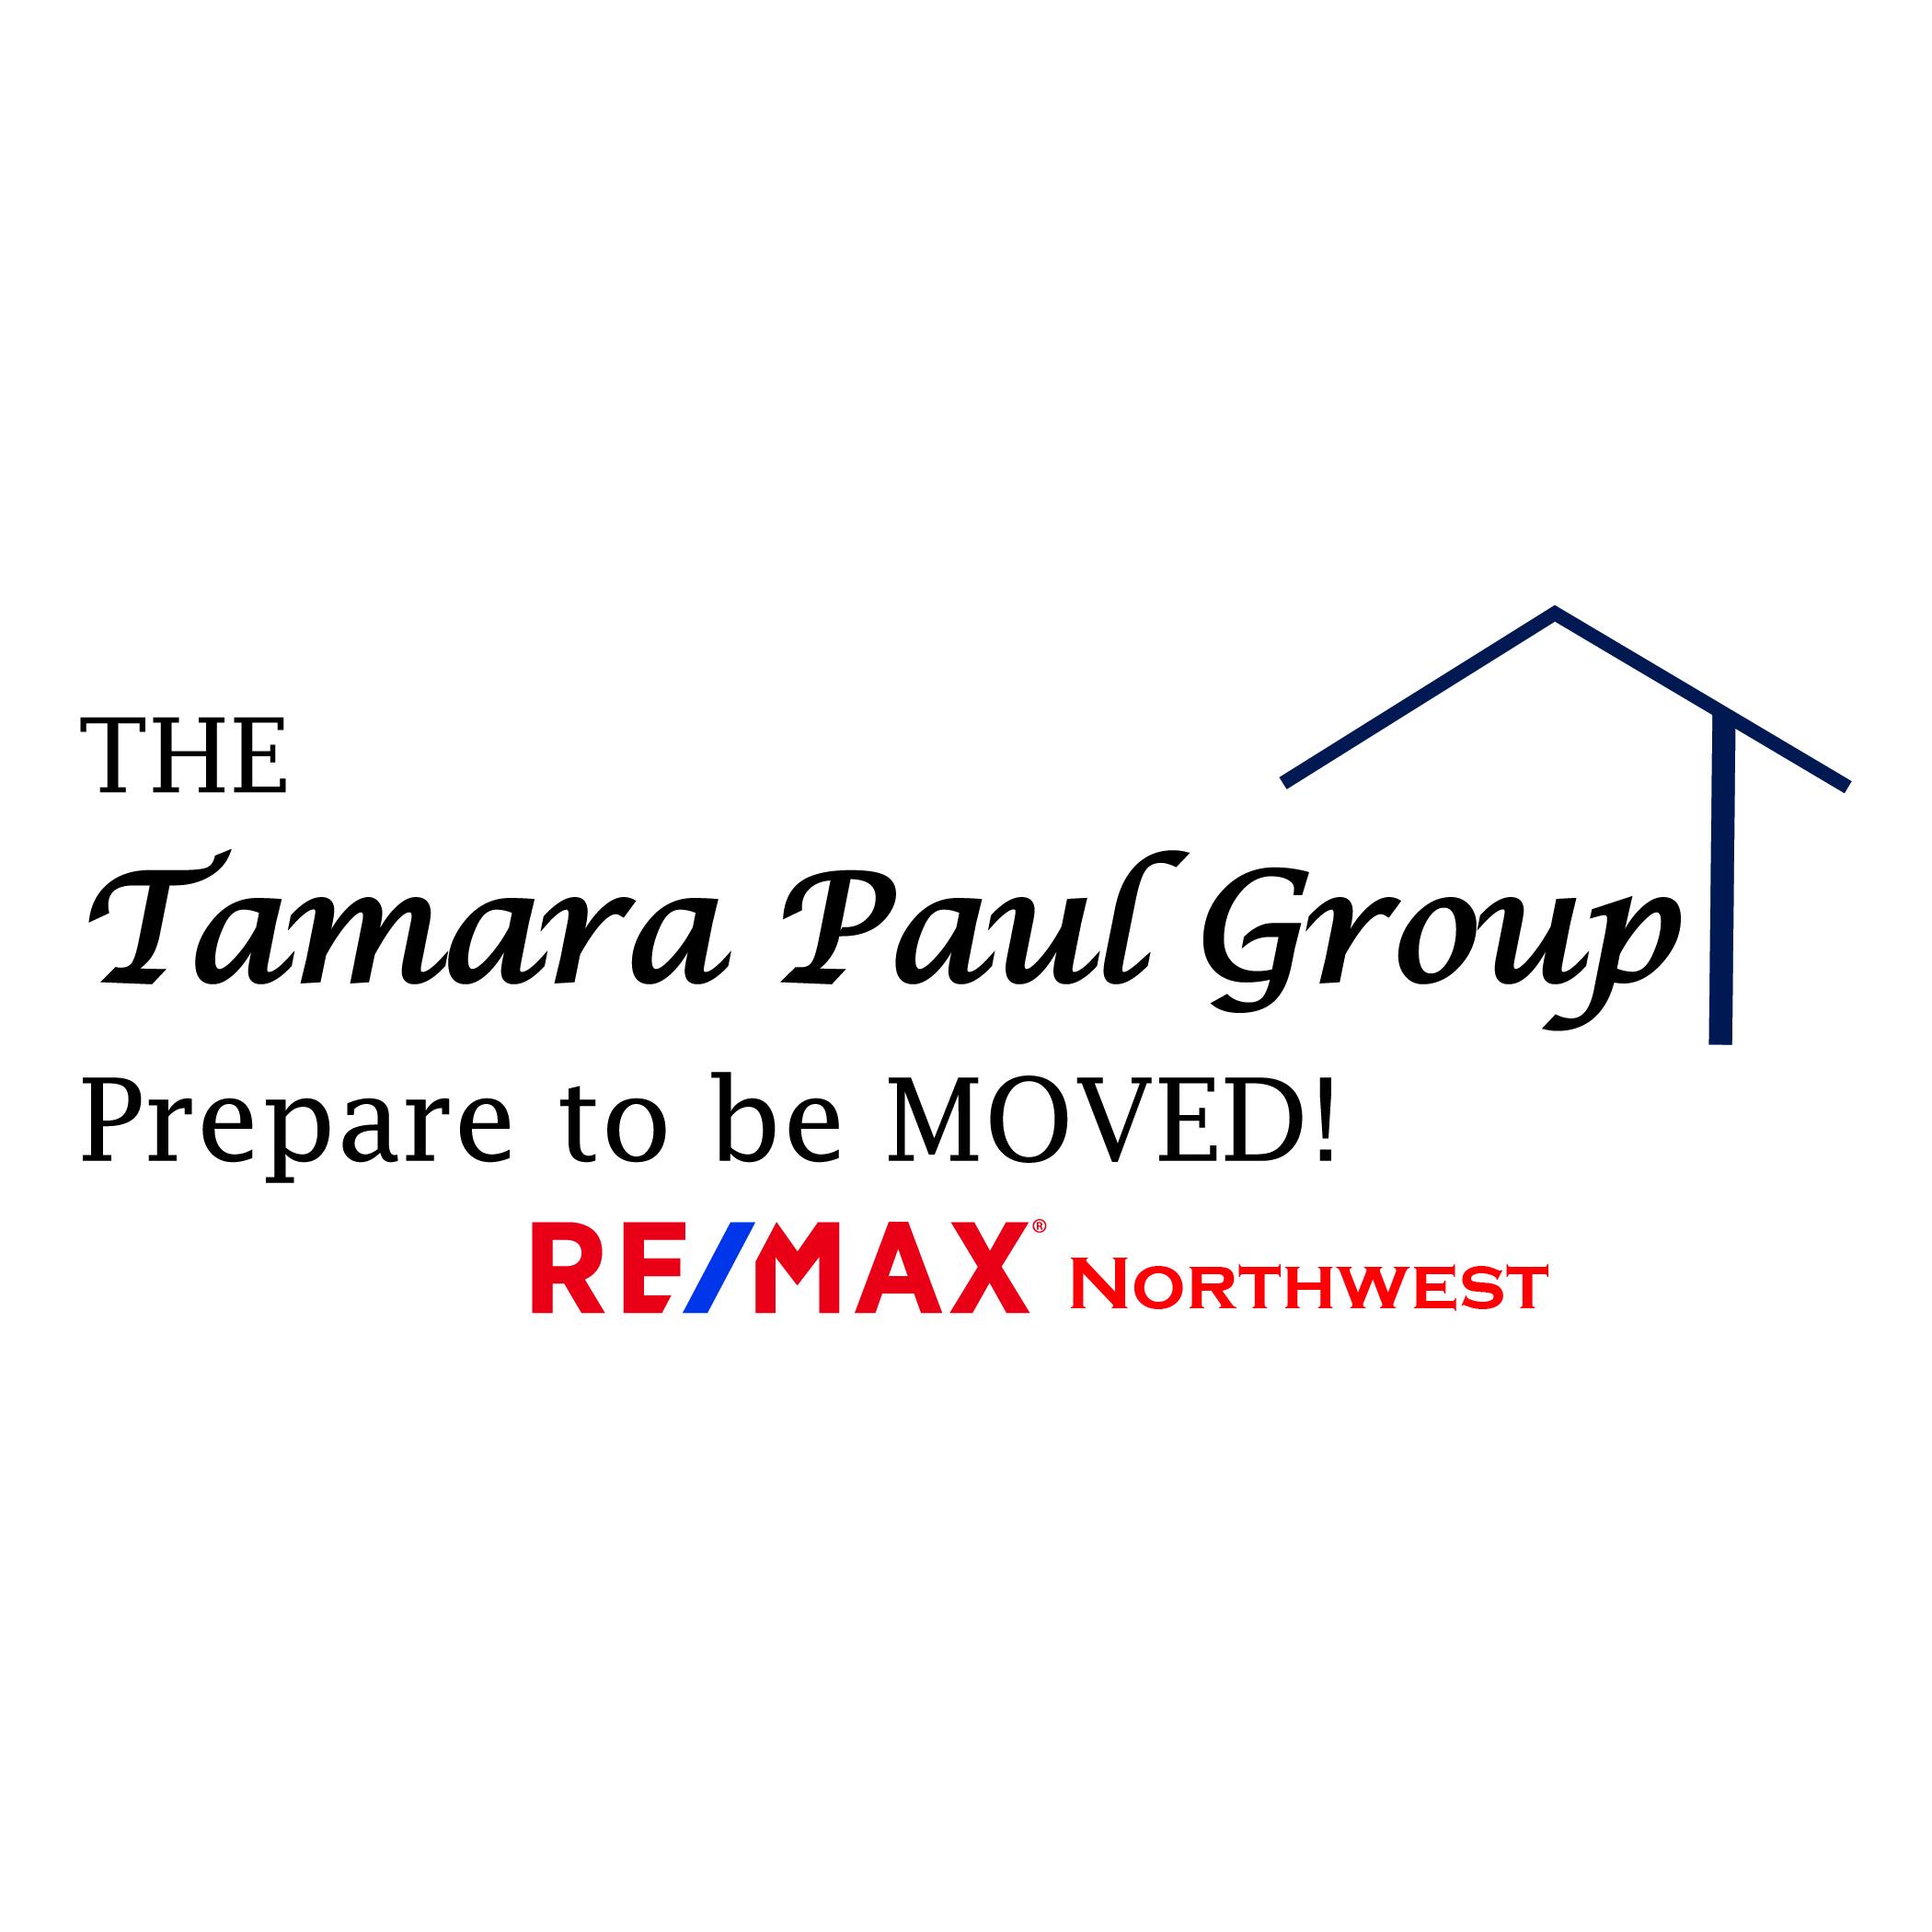 The Tamara Paul Team